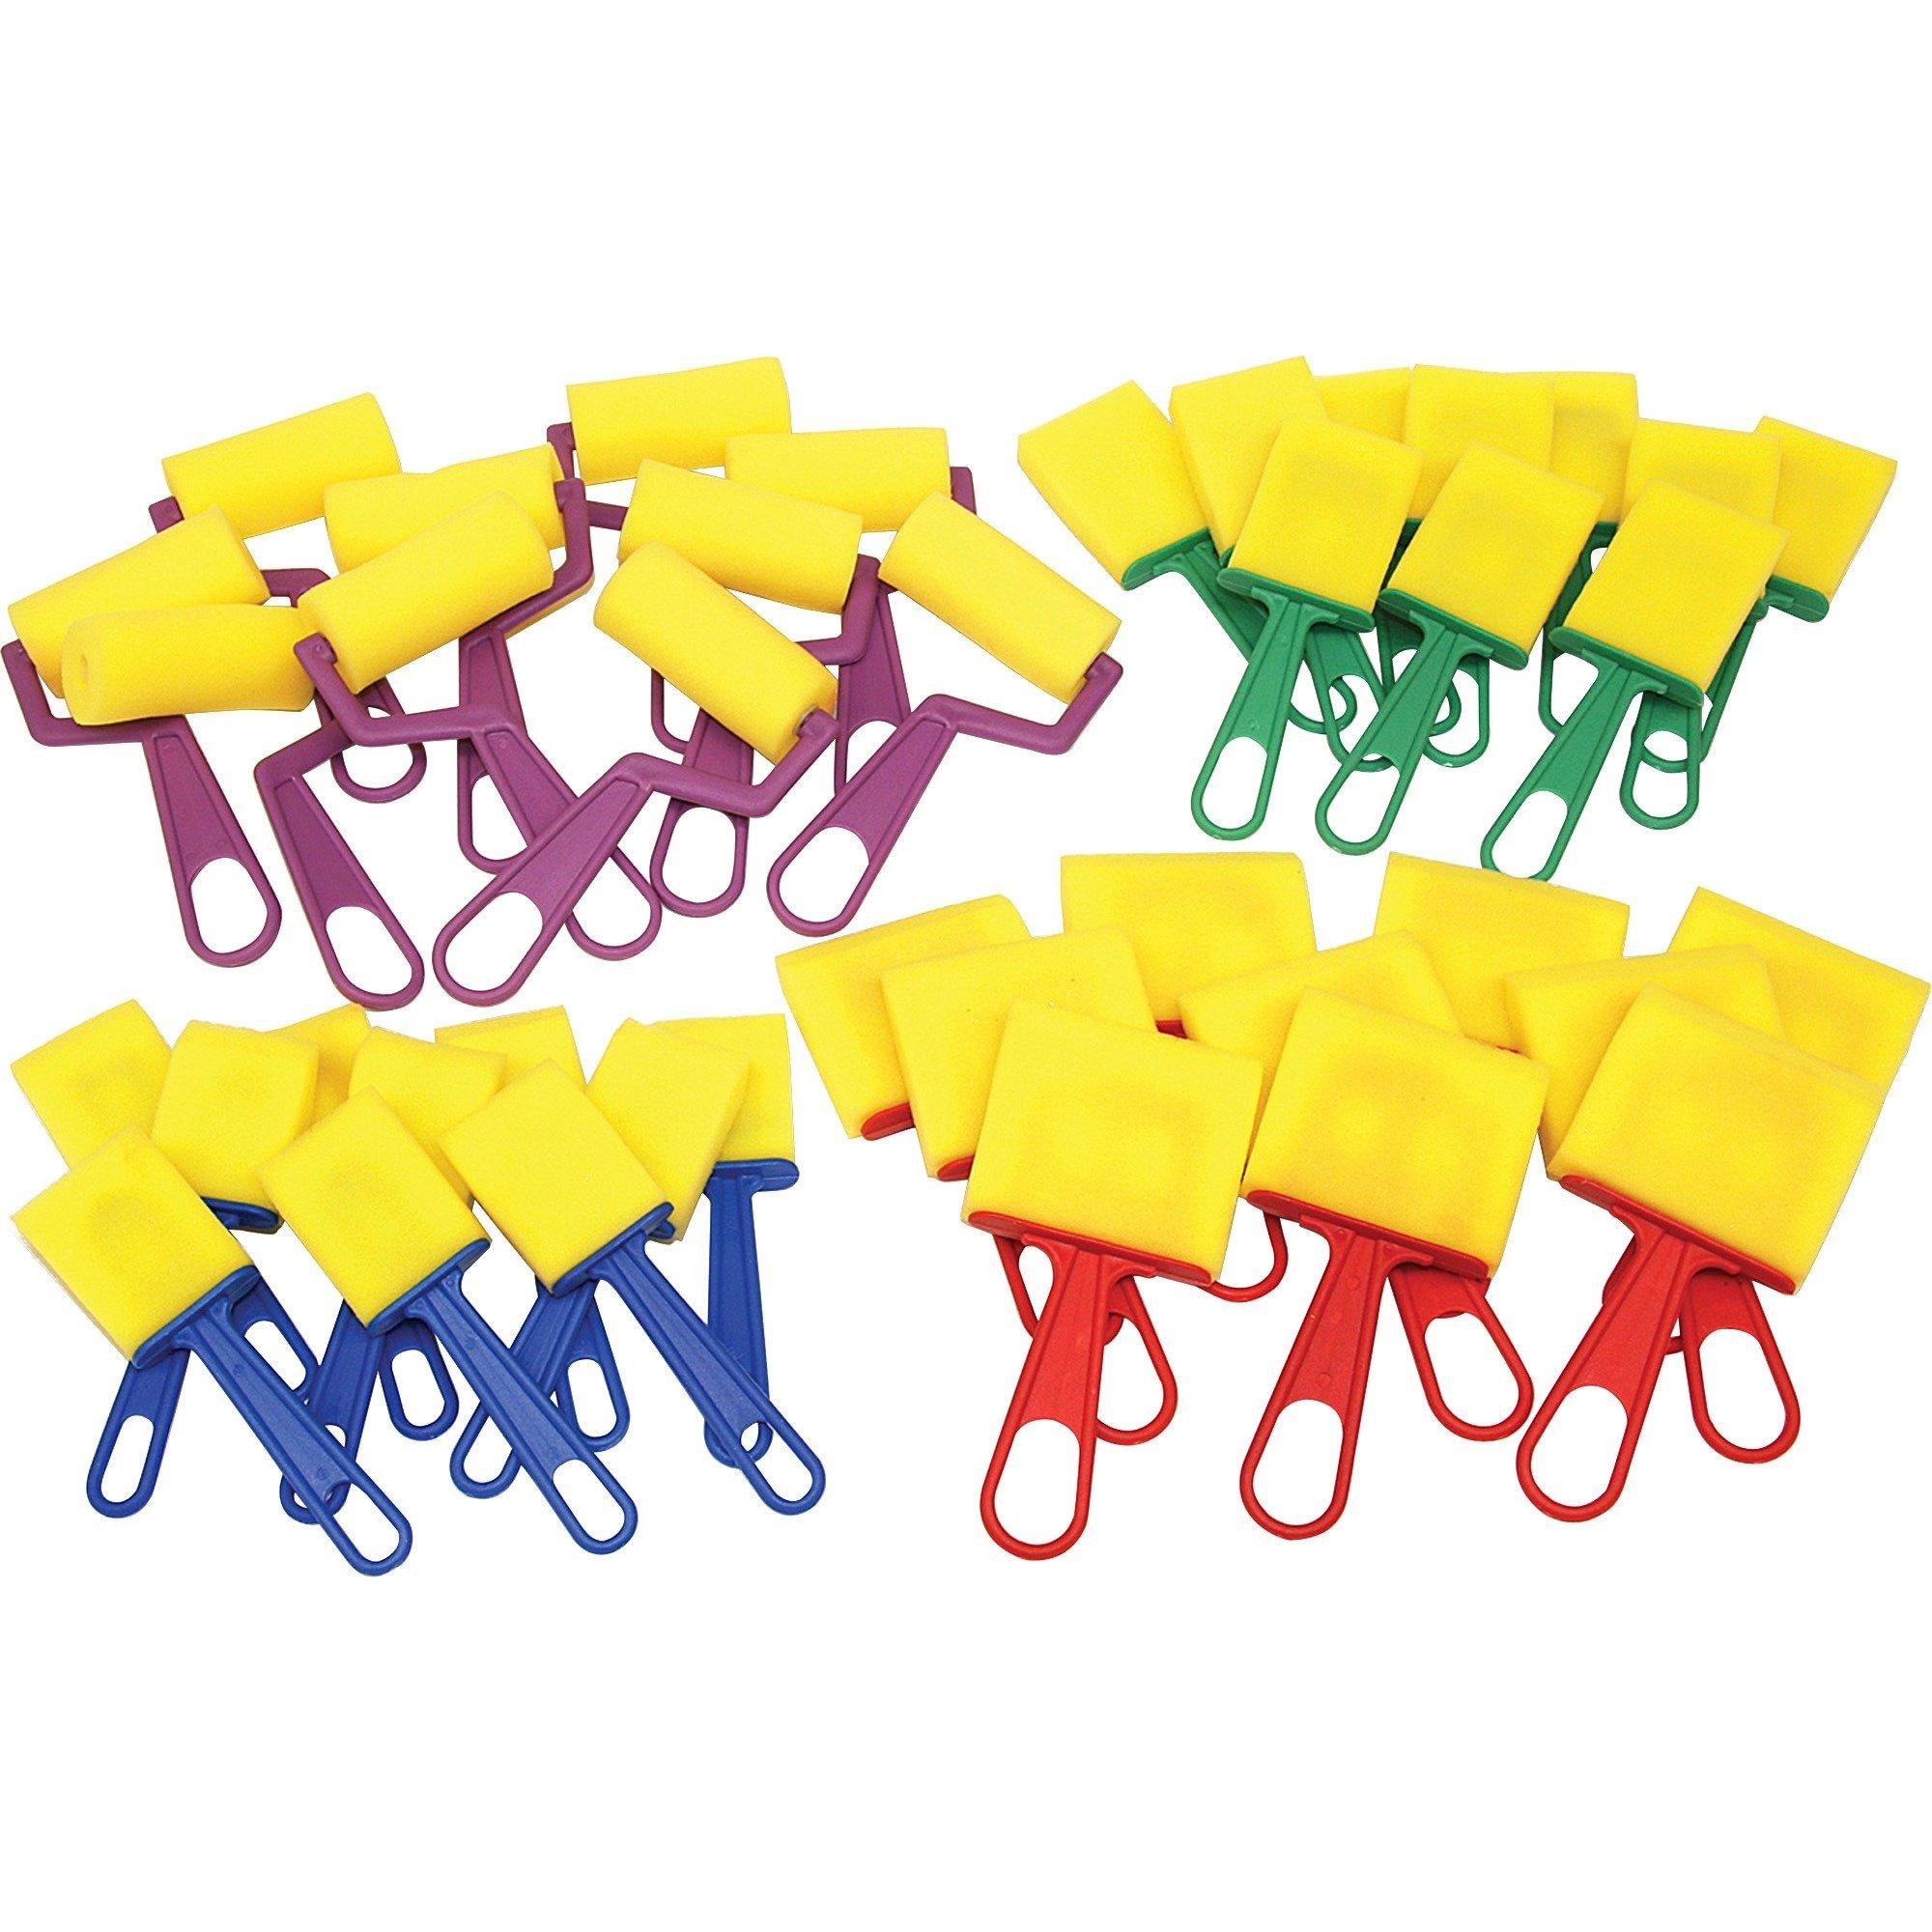 CKC5212 - ChenilleKraft Foam Brushes/Rollers Classroom Pack